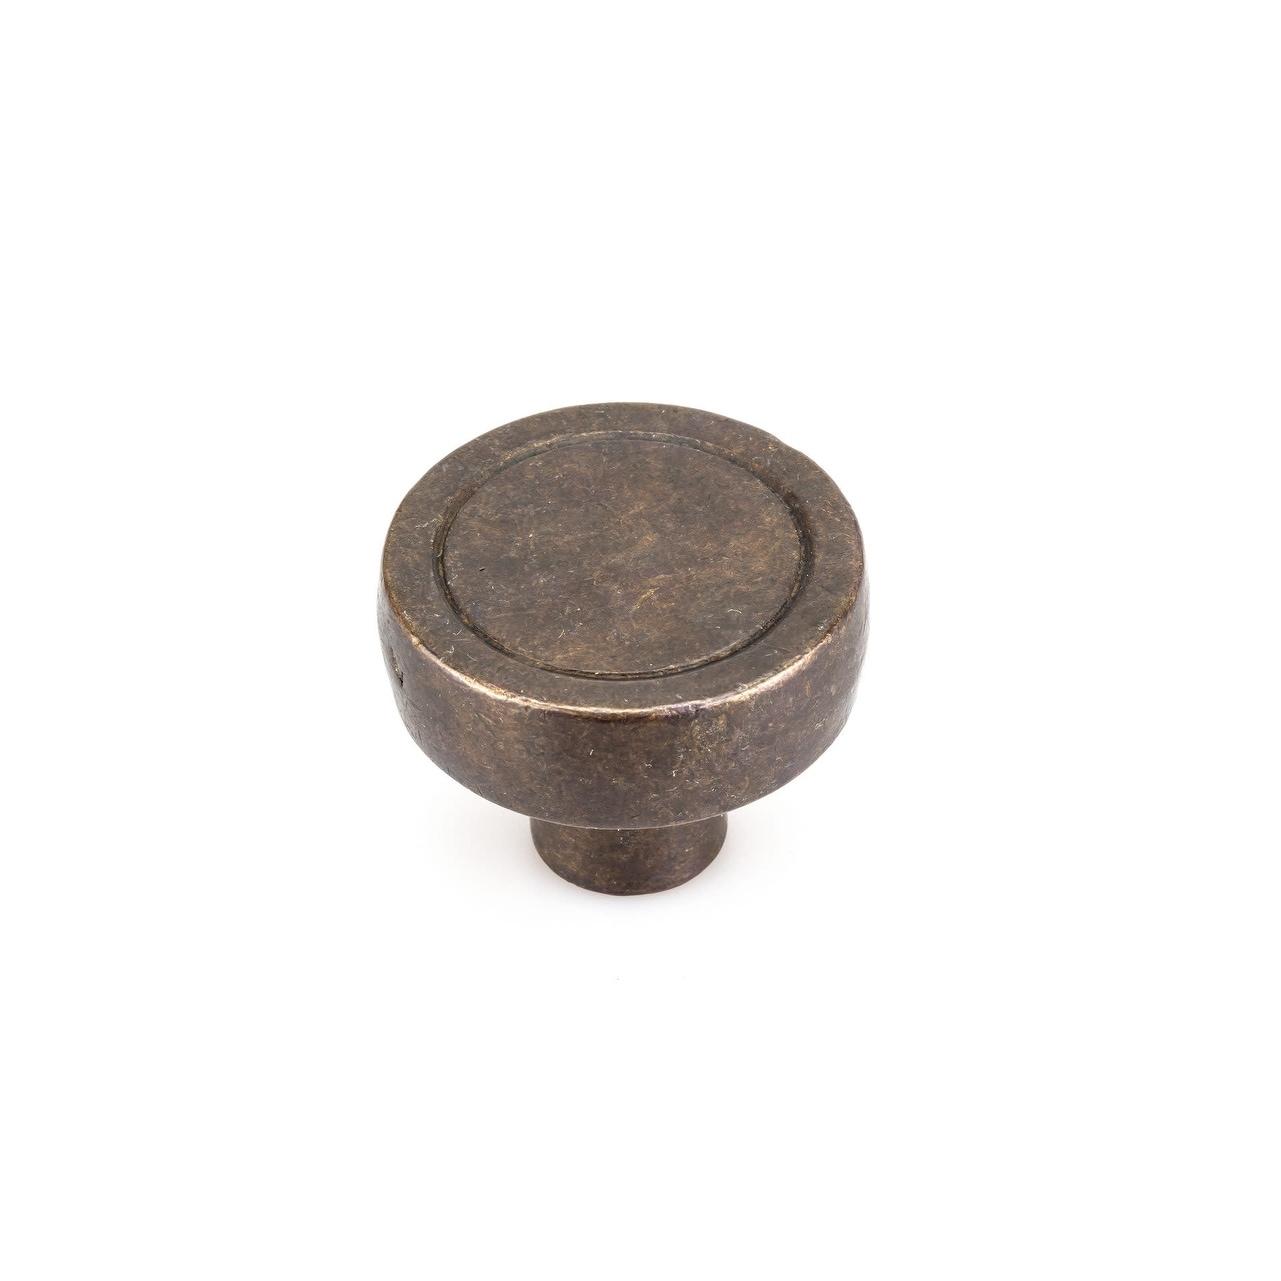 Richelieu COKN175C4  1-3/4 Mushroom Cabinet Knob (Copper Bronze)